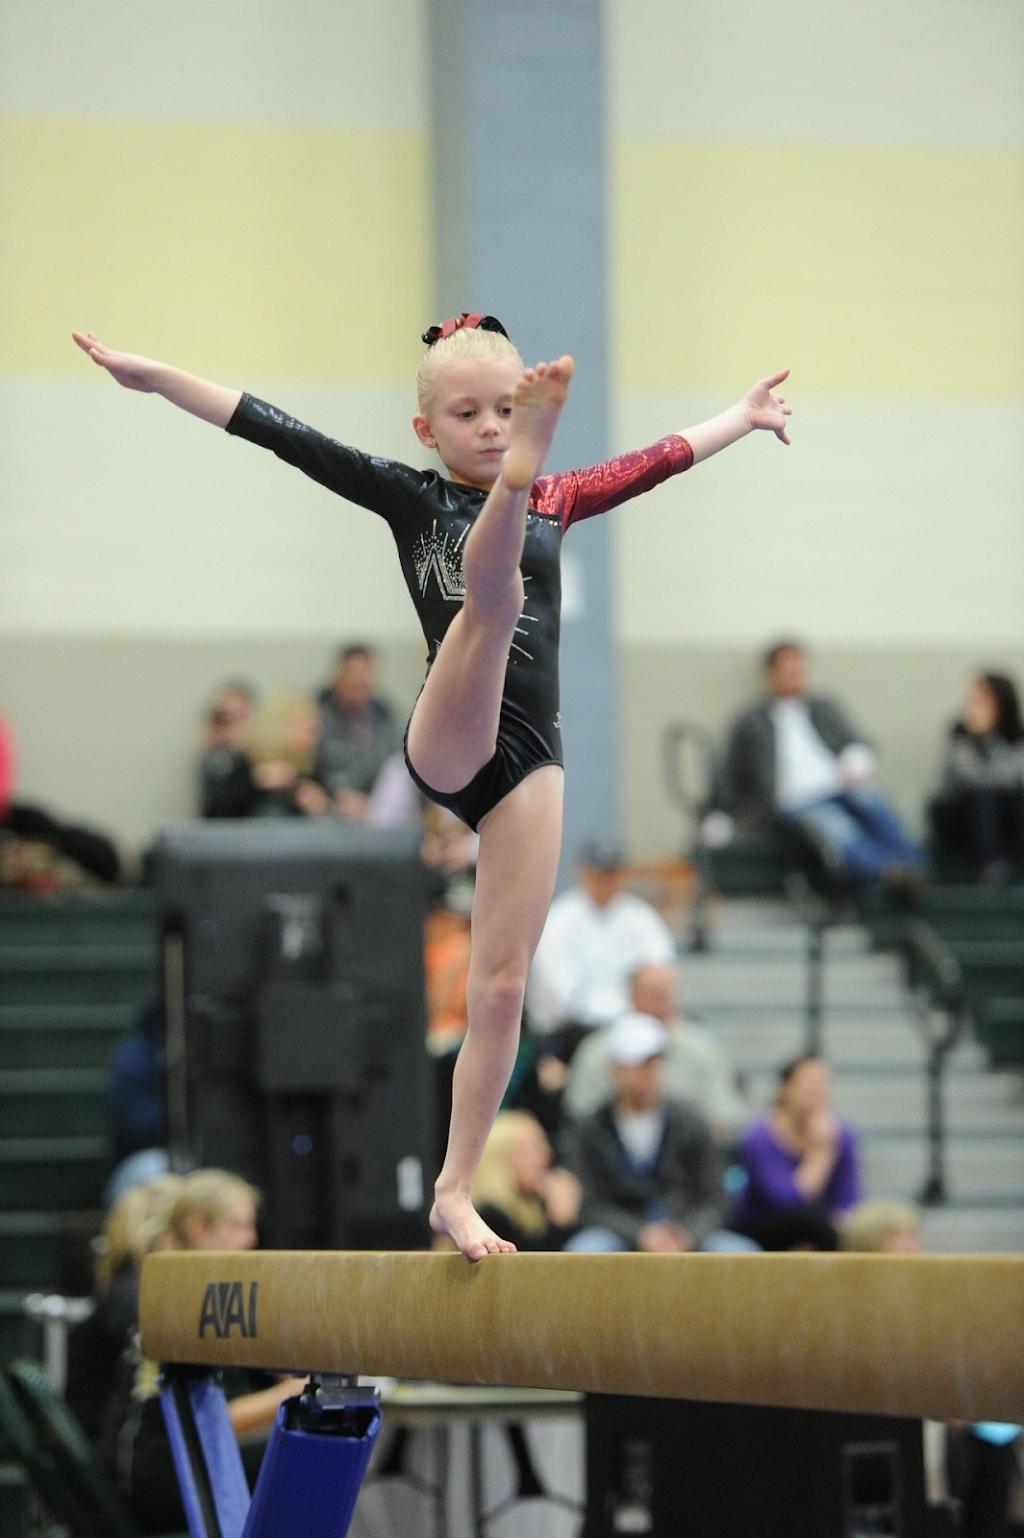 Suffield Gymnastics Academy - gym  | Photo 2 of 10 | Address: 110A Ffyler Pl, Suffield, CT 06078, USA | Phone: (860) 936-1833